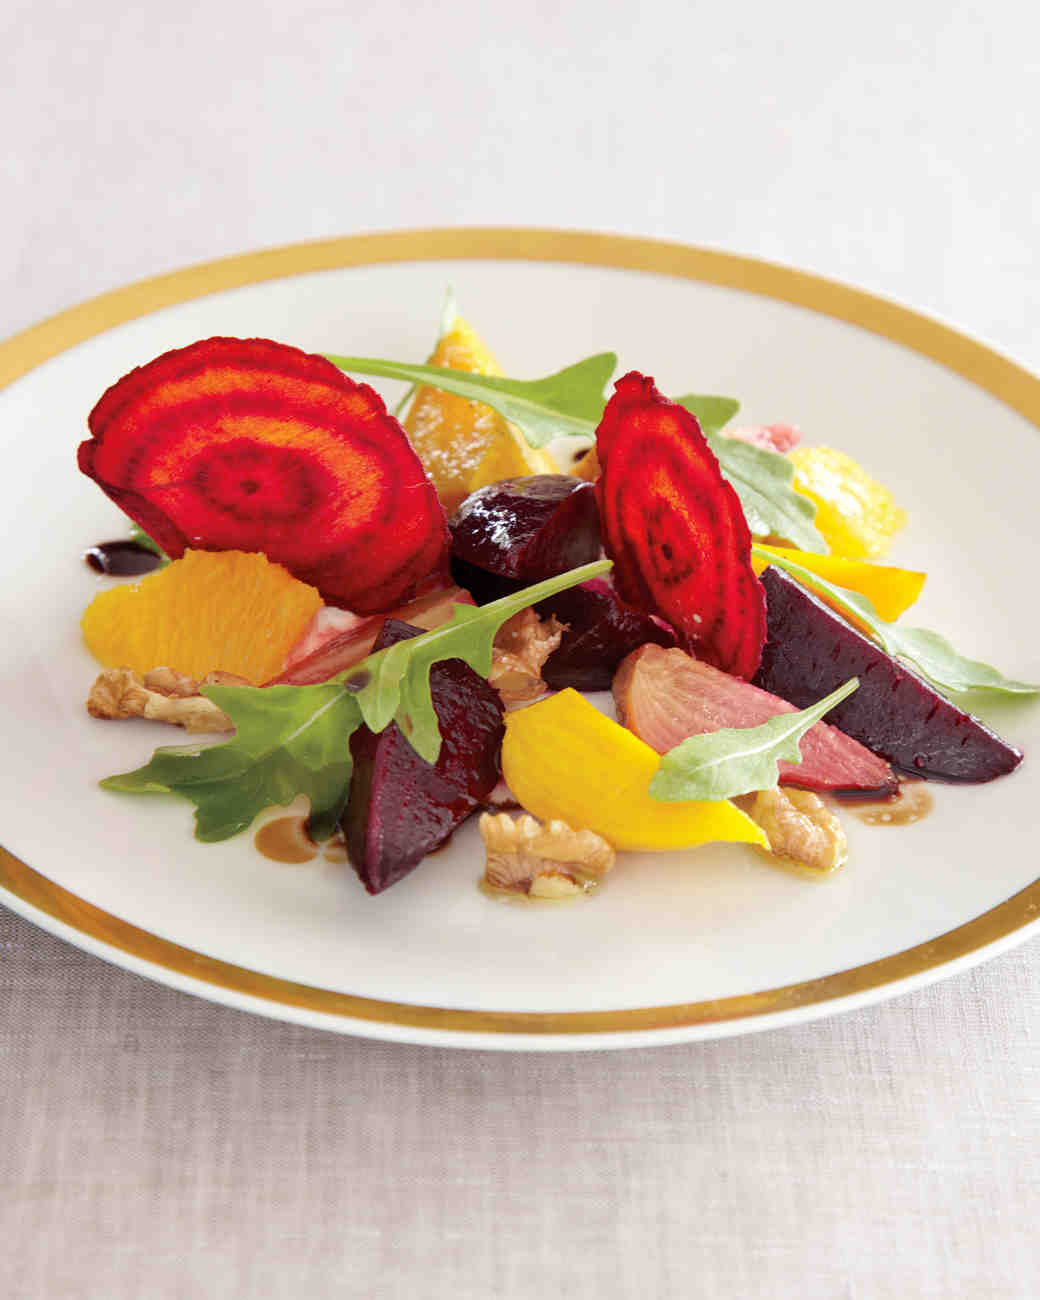 beet-salad-0811mwd107282.jpg